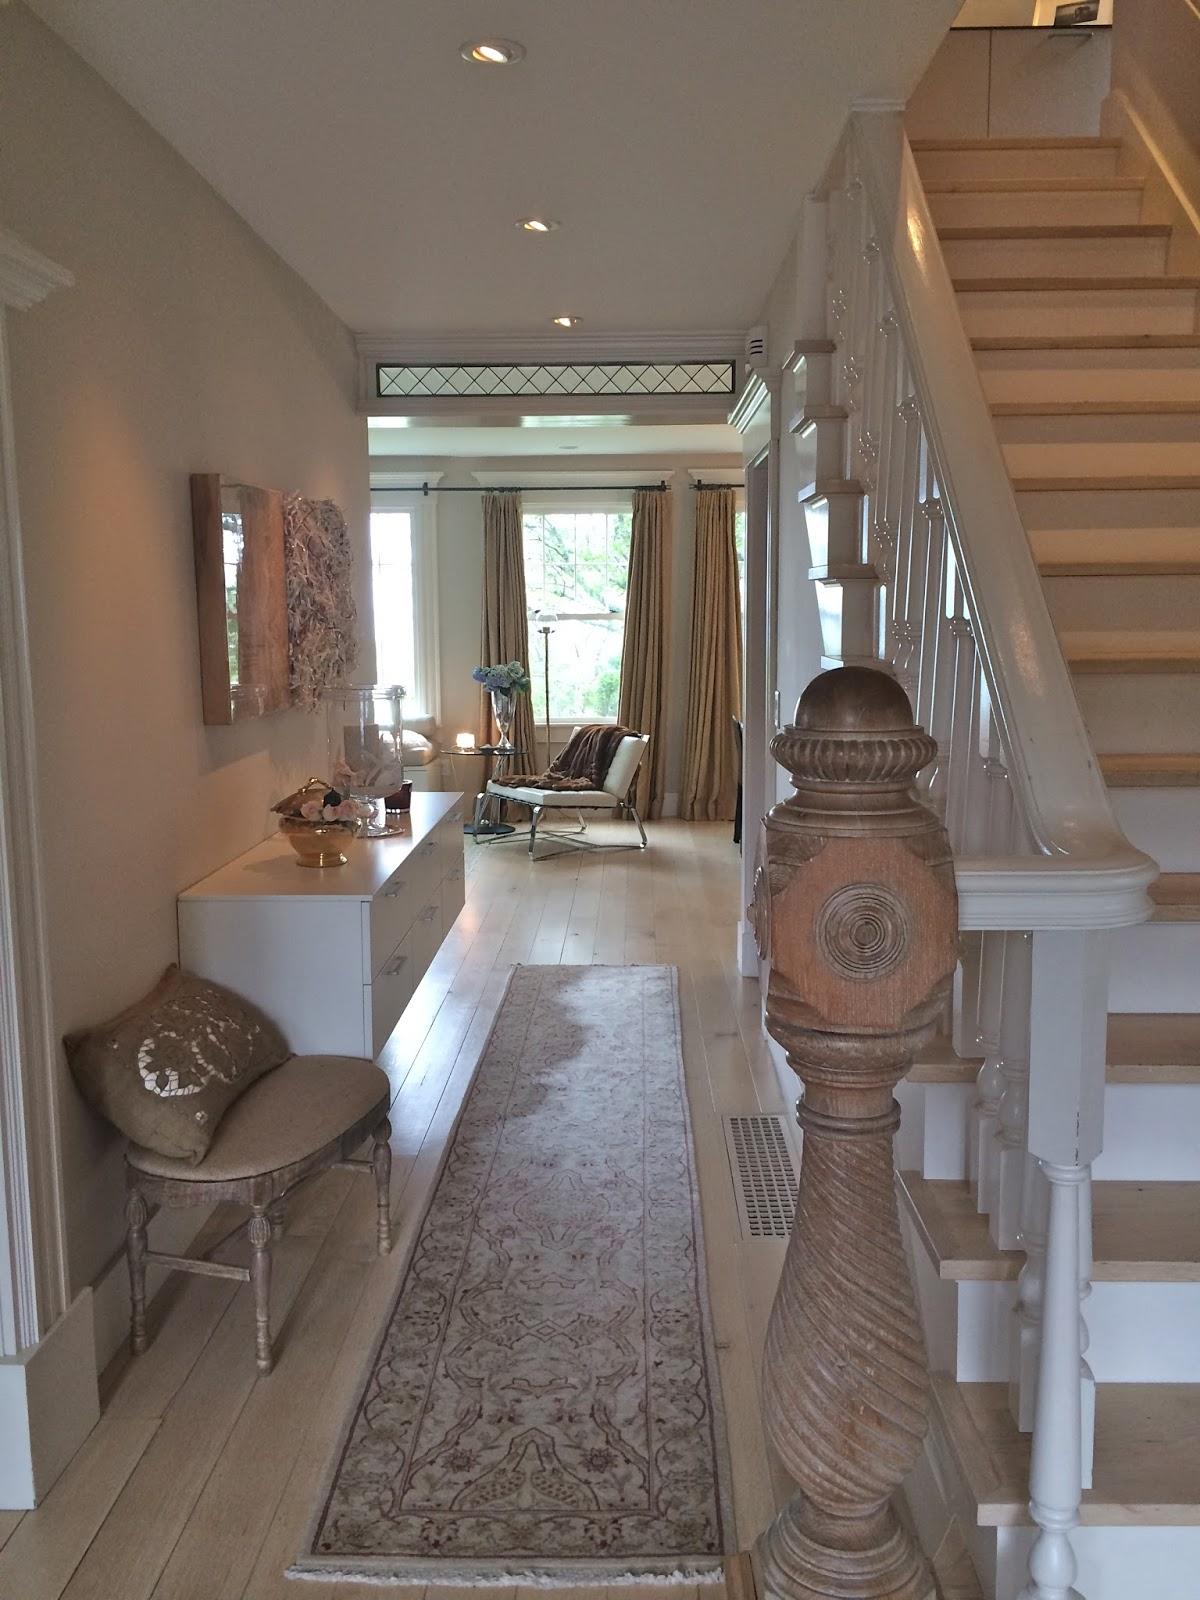 Maison Decor: Style Alert! Vintage Luxe Mod Rocks this Shingle Style ...